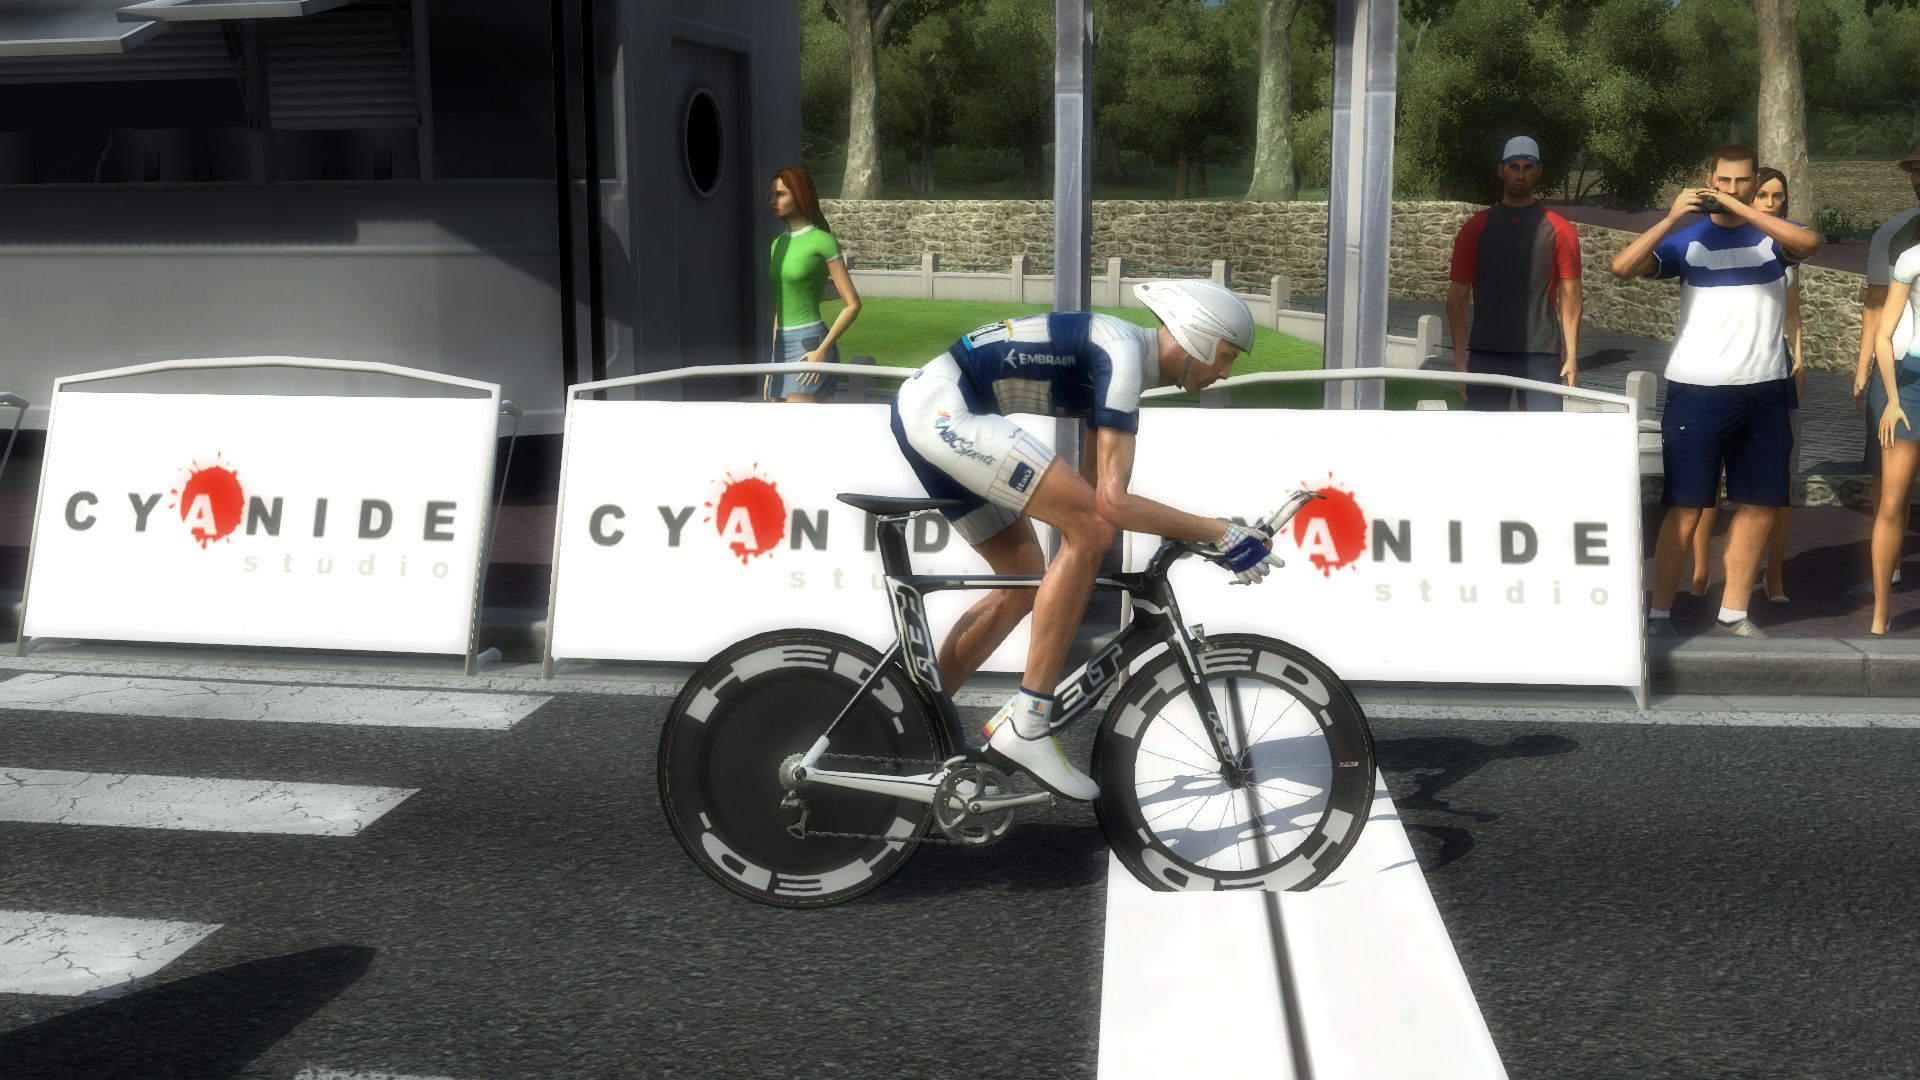 pcmdaily.com/images/mg/2019/Races/C1/Bayern/S4/mg19_bay_s04_53.jpg